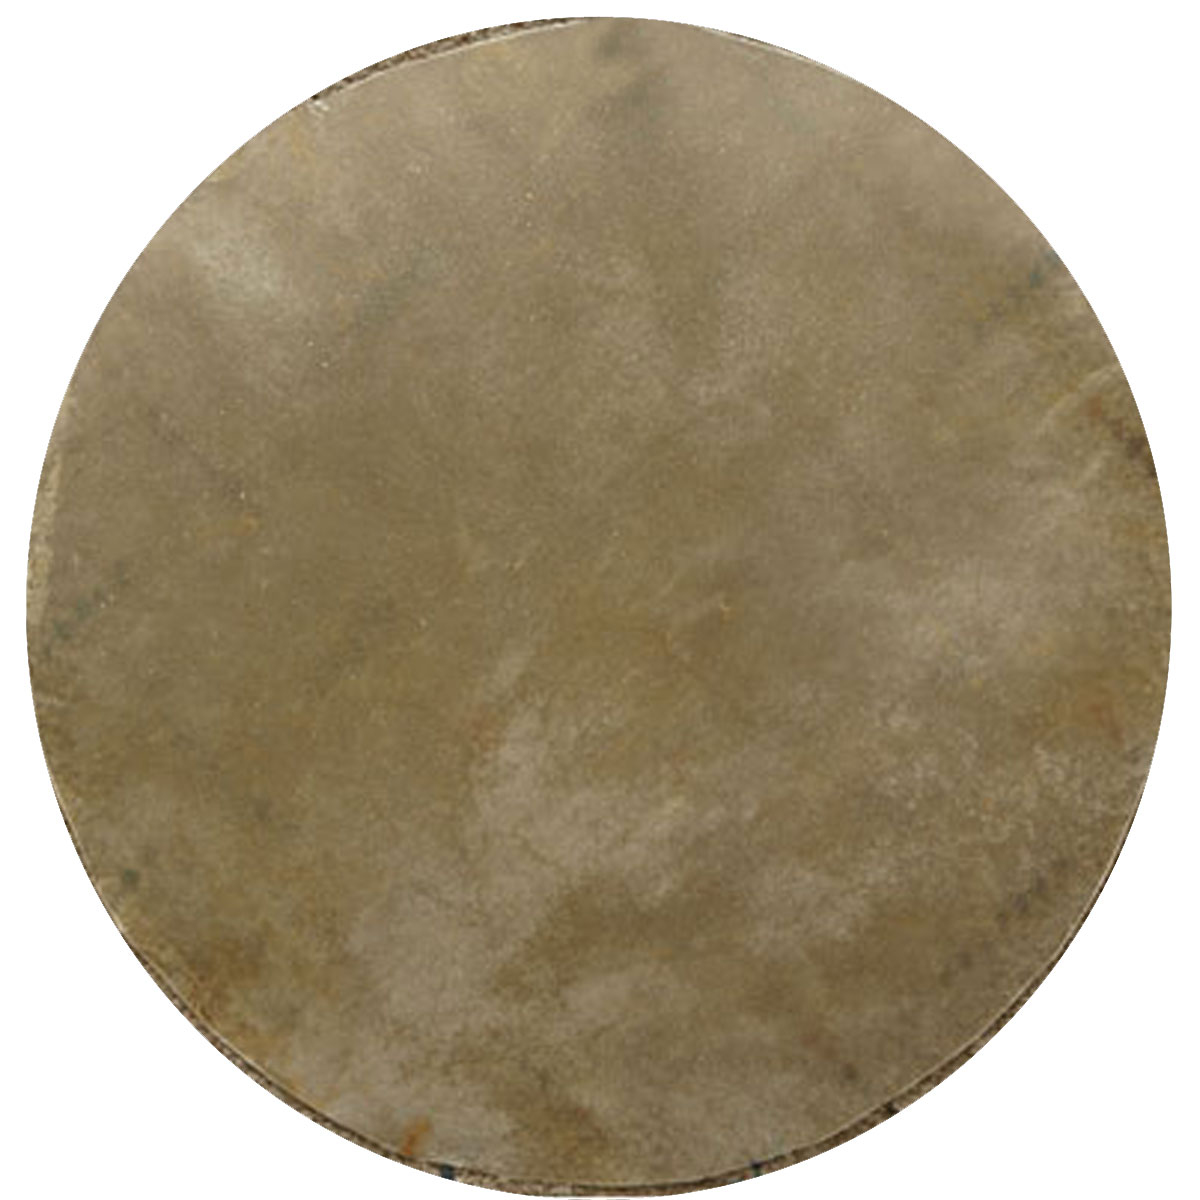 mid east 12 inch natural calfskin drum head medium cf12 md. Black Bedroom Furniture Sets. Home Design Ideas